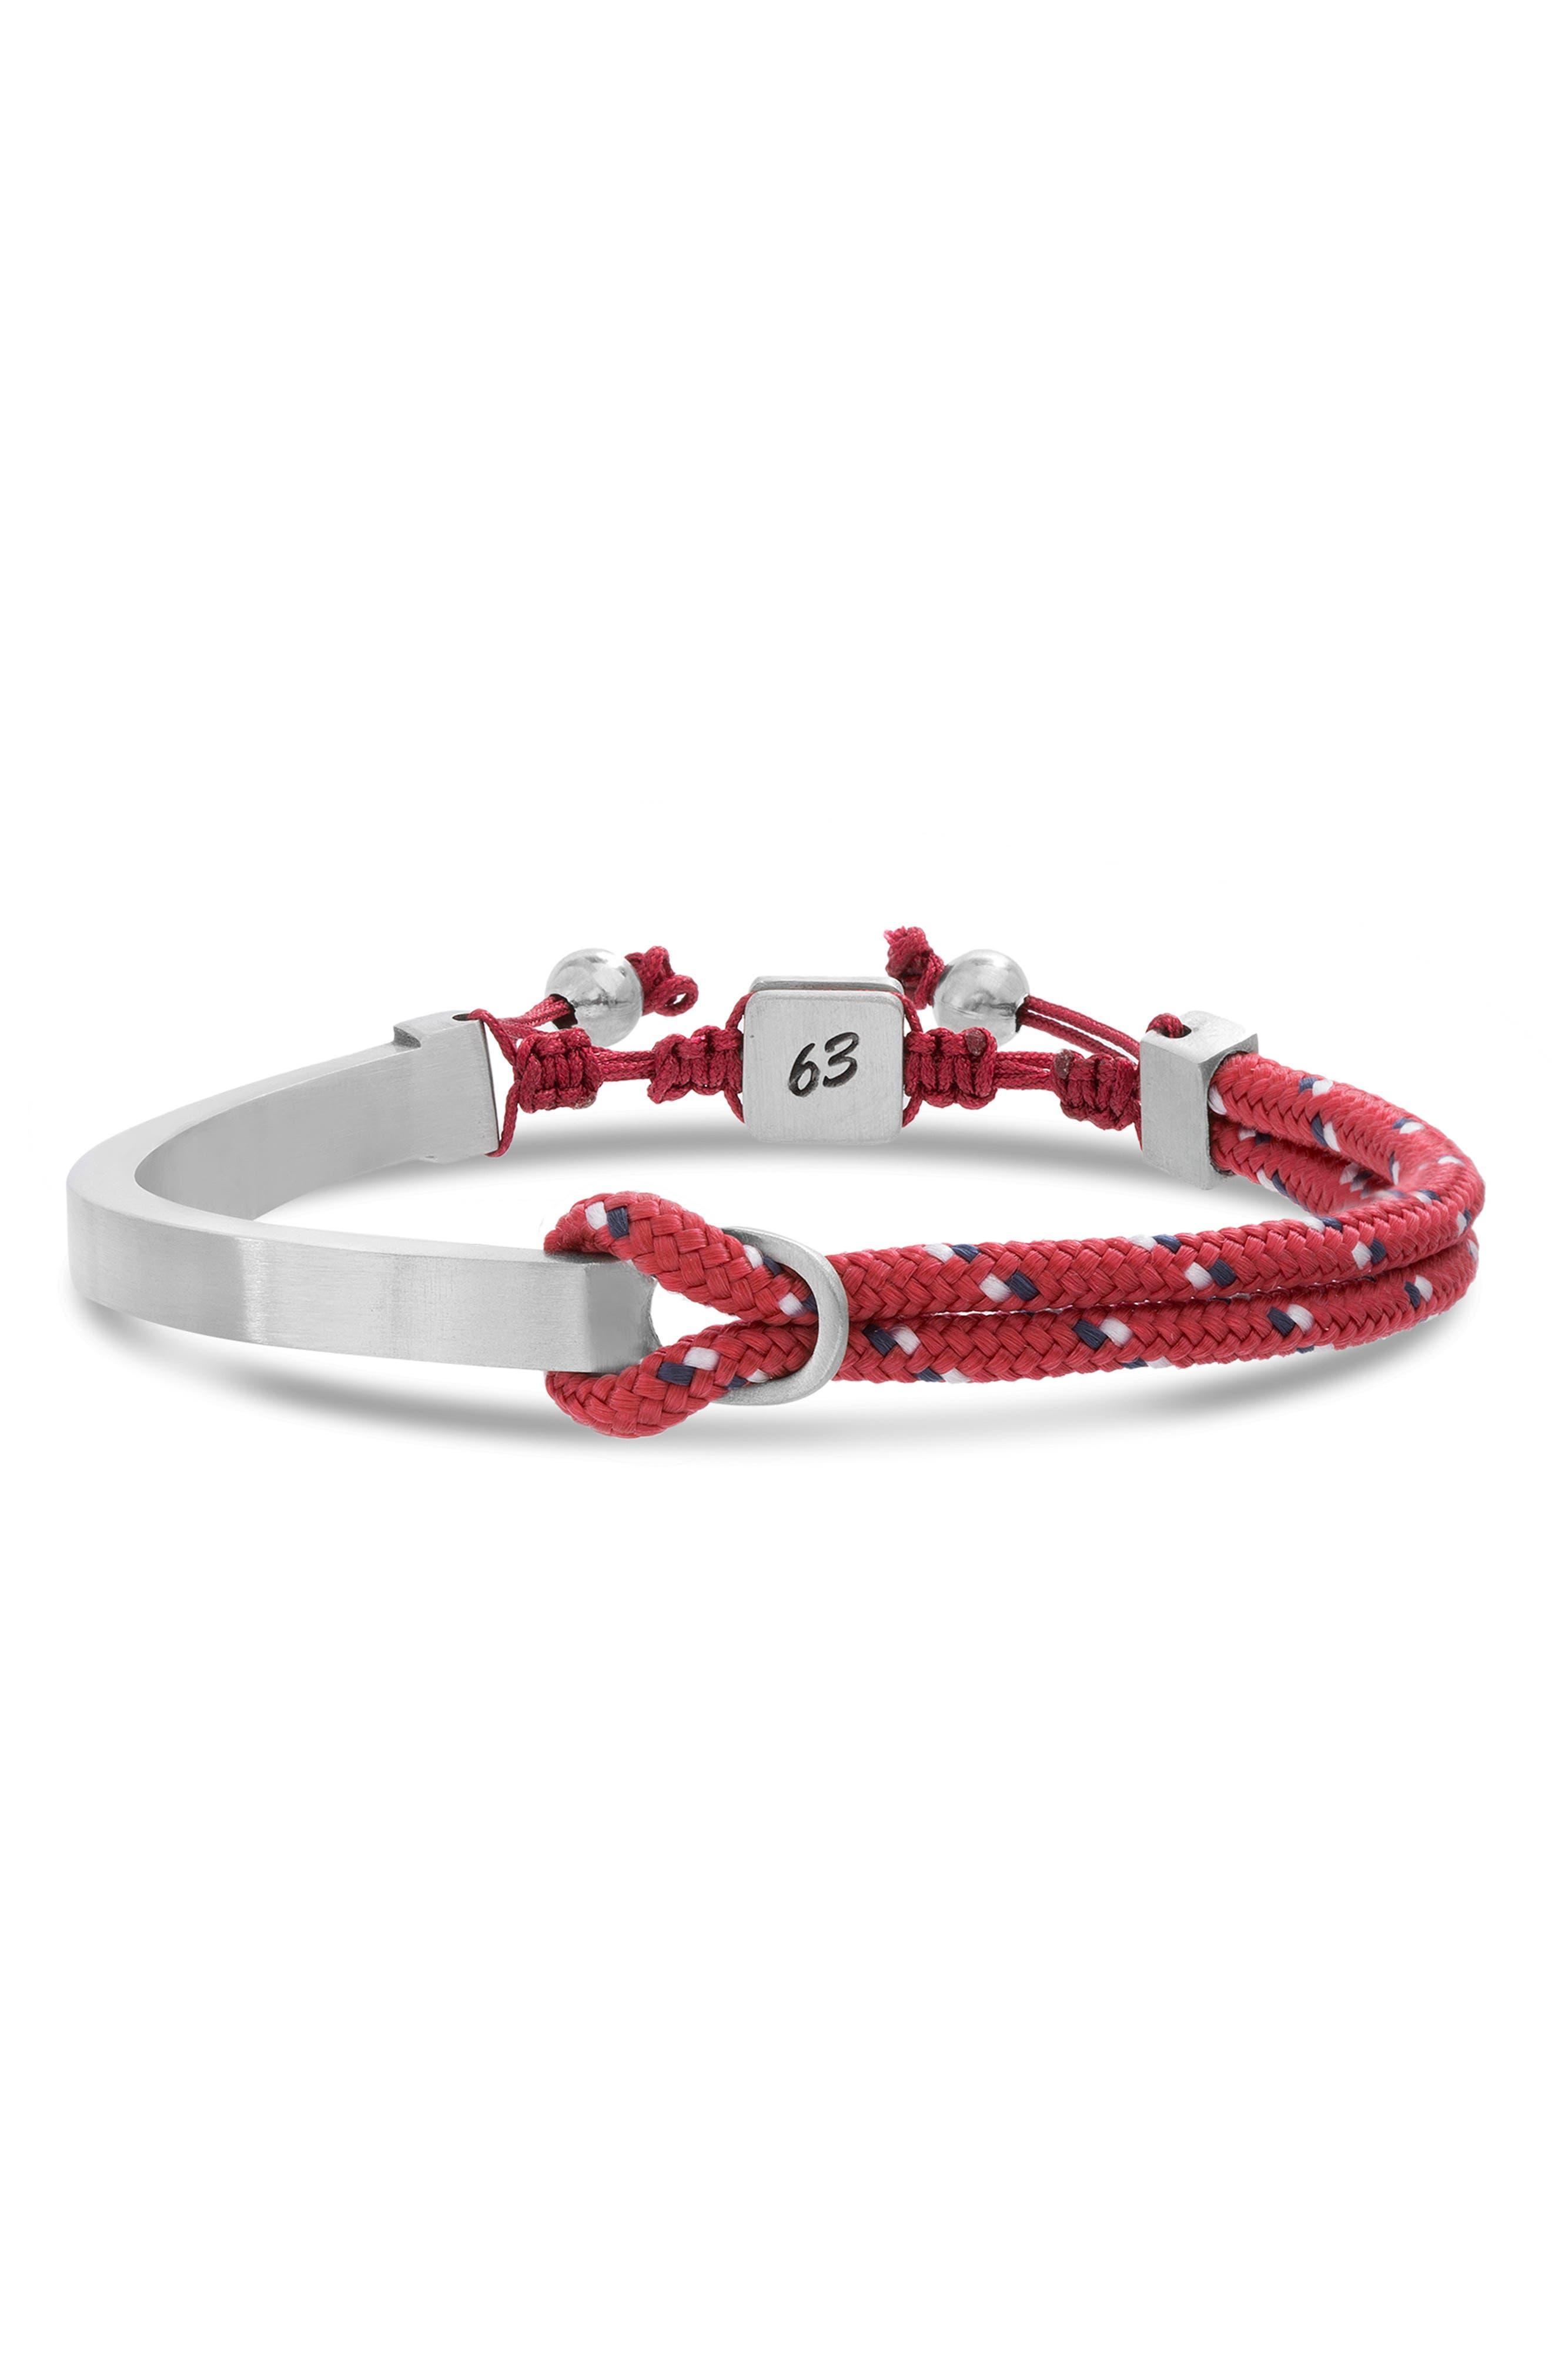 BEN SHERMAN Adjustable Id Bracelet in Blue